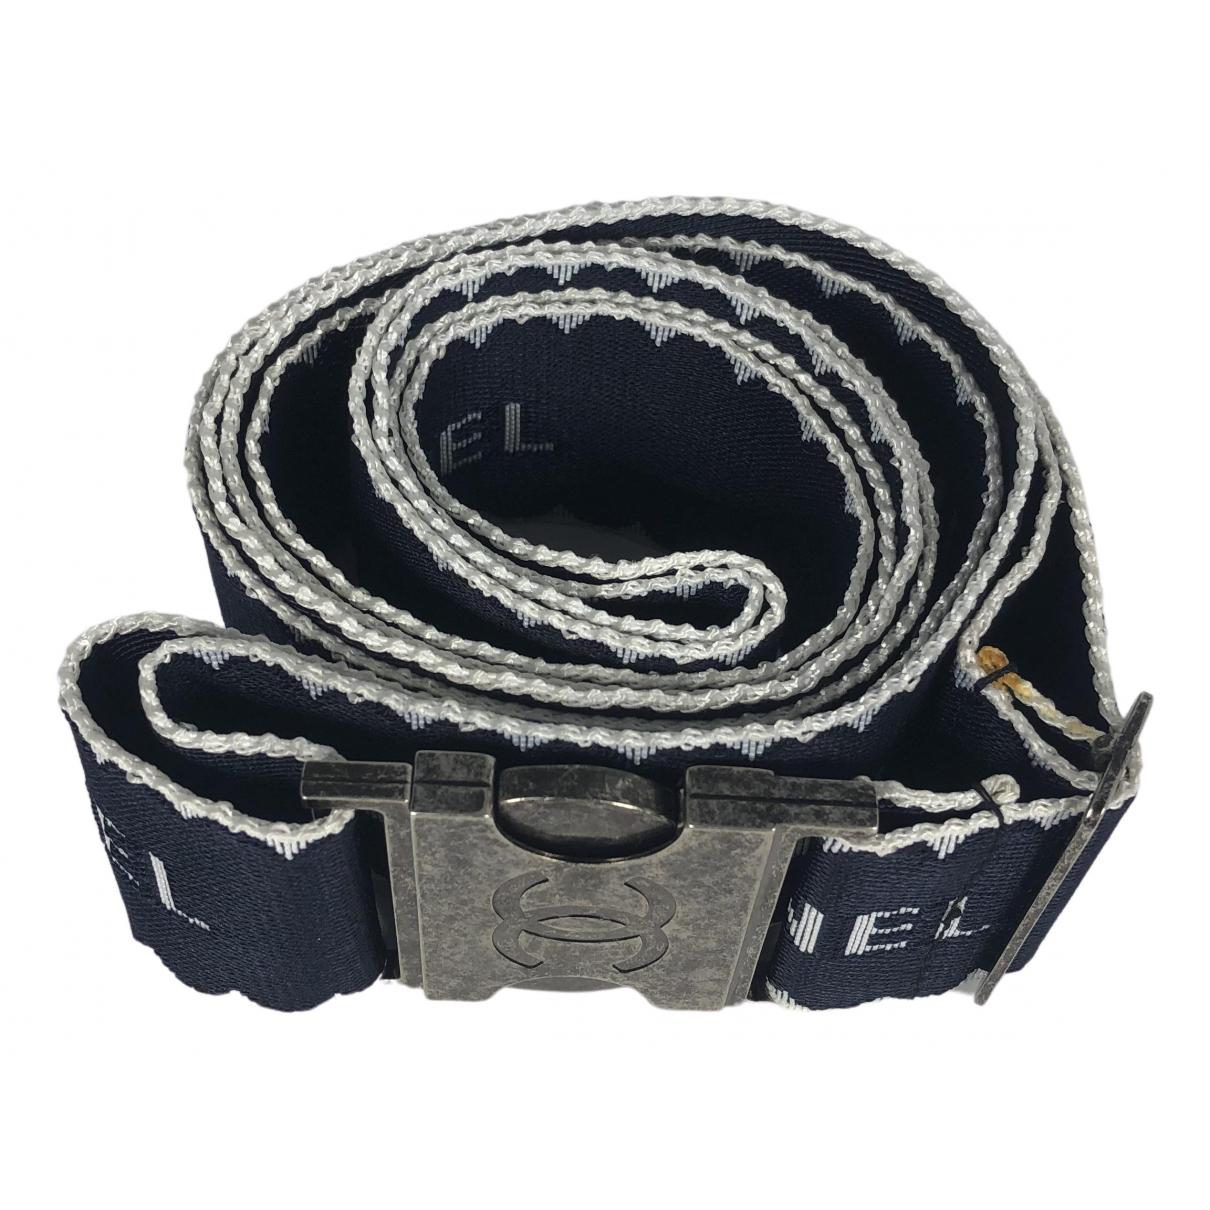 Chanel \N Blue Cloth belt for Women L International